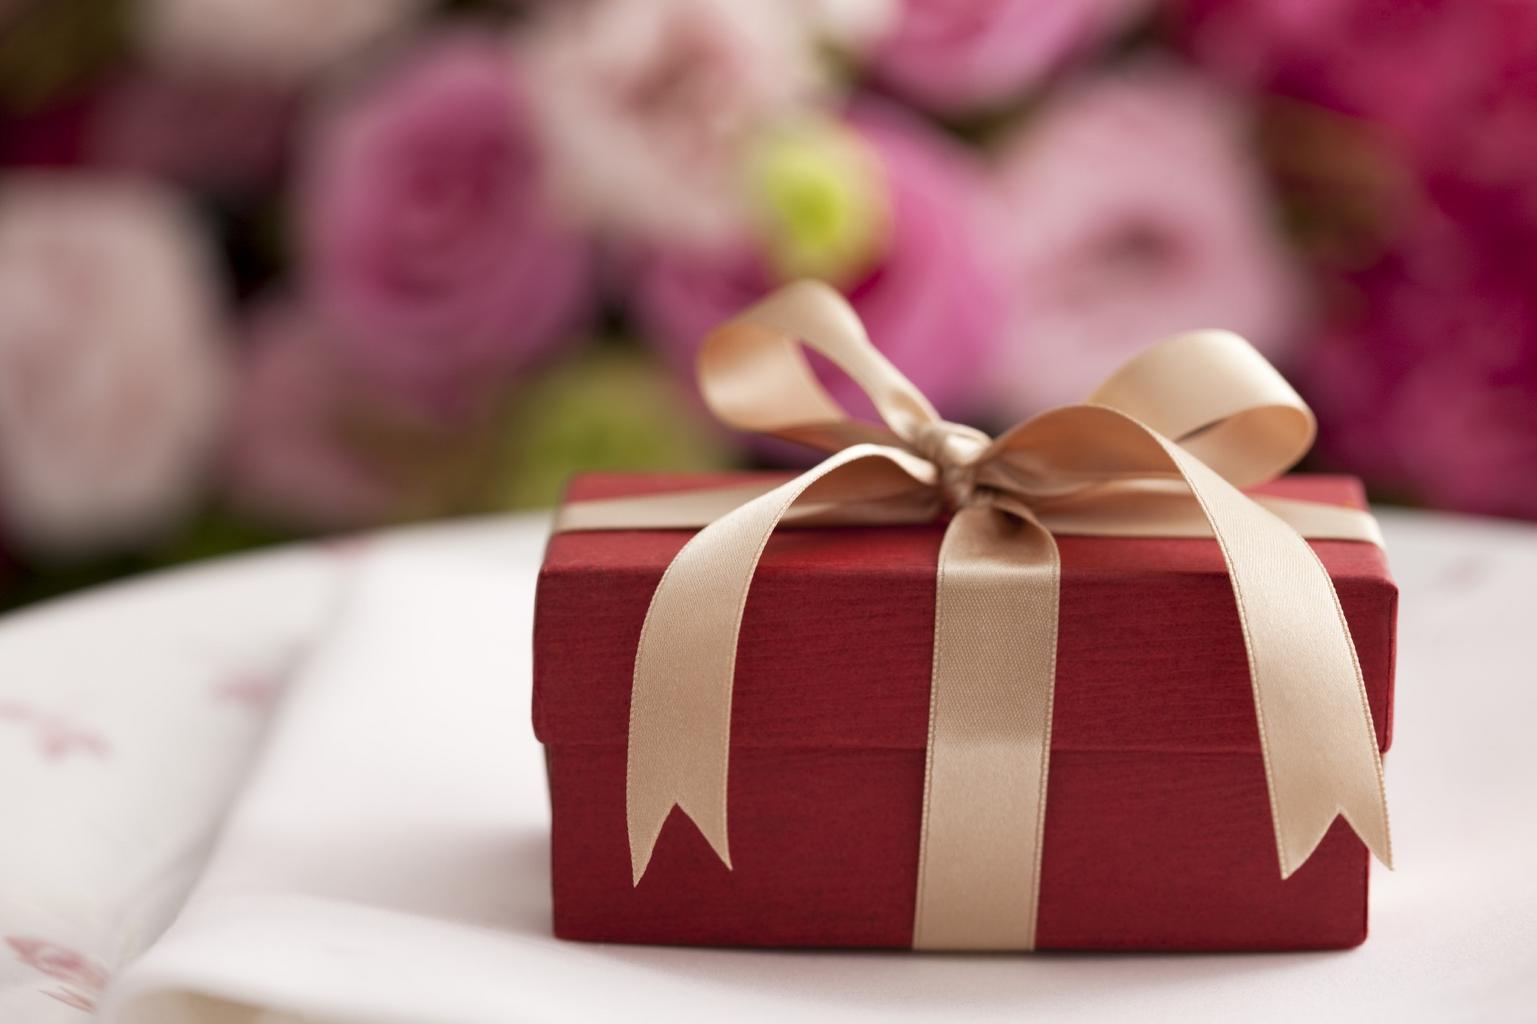 wedding gifts a modern dilemma wedding gift registry1